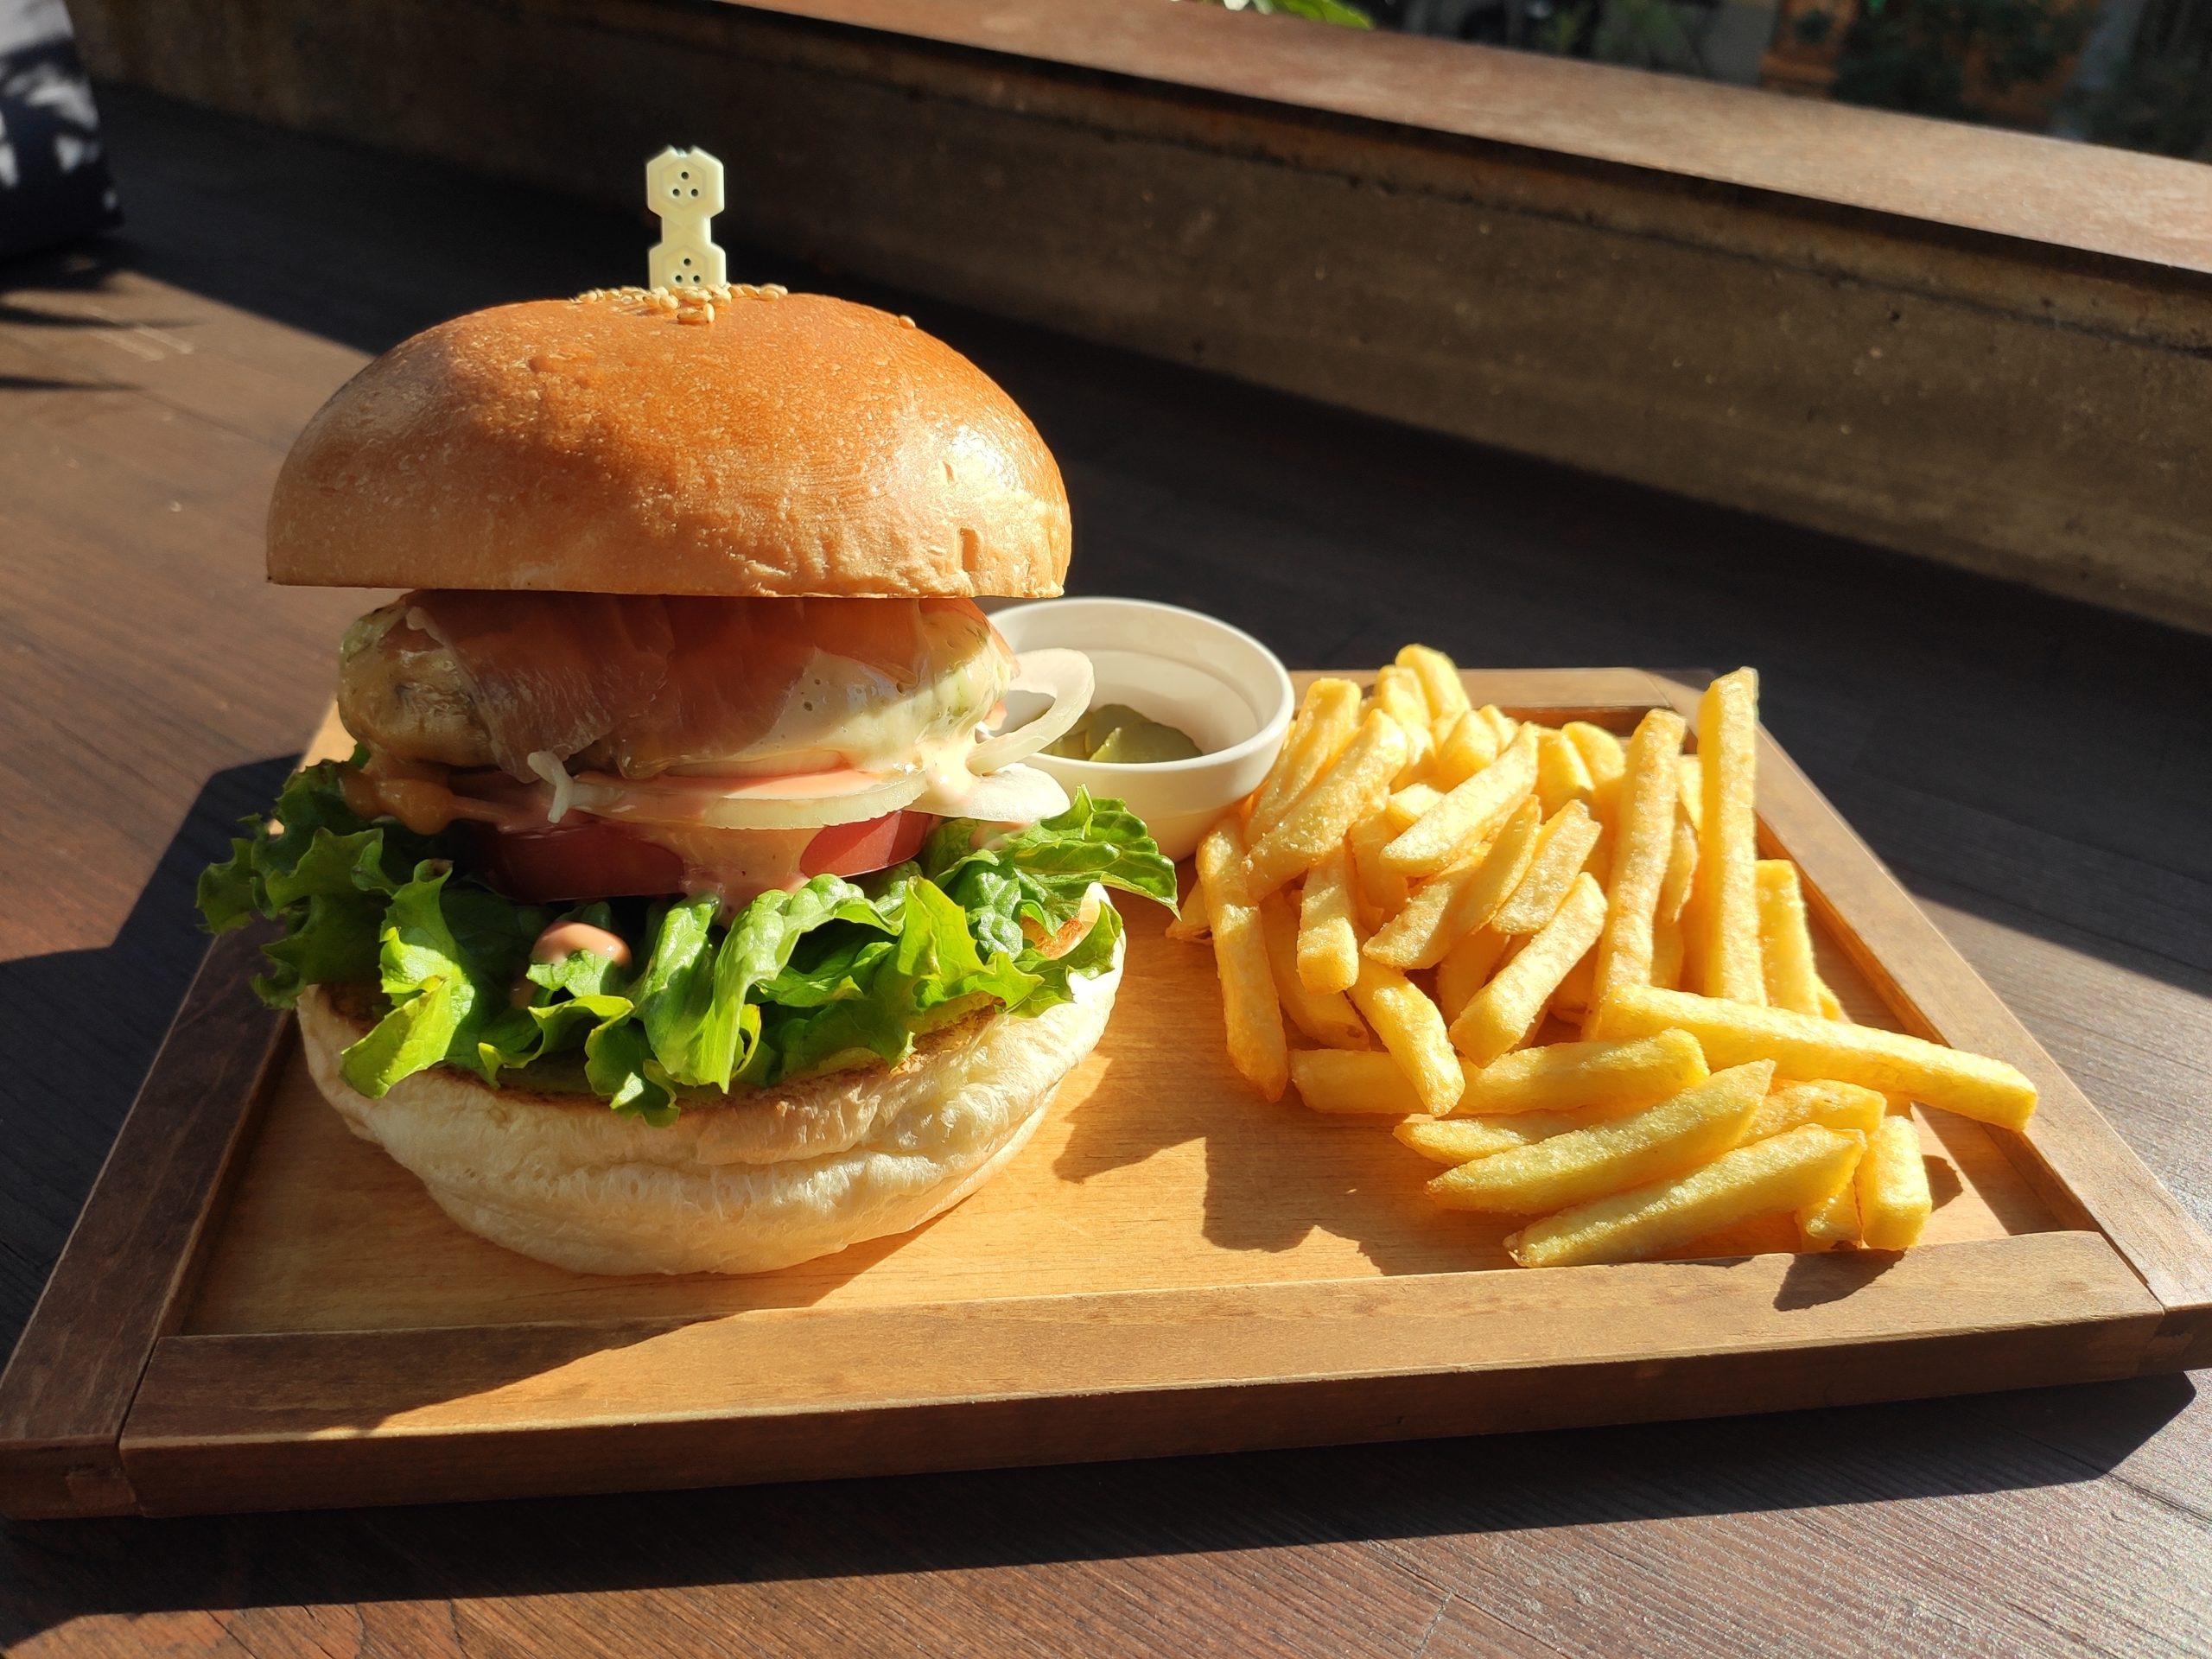 [Review] Back Country Burgers @ Kofu, Japan